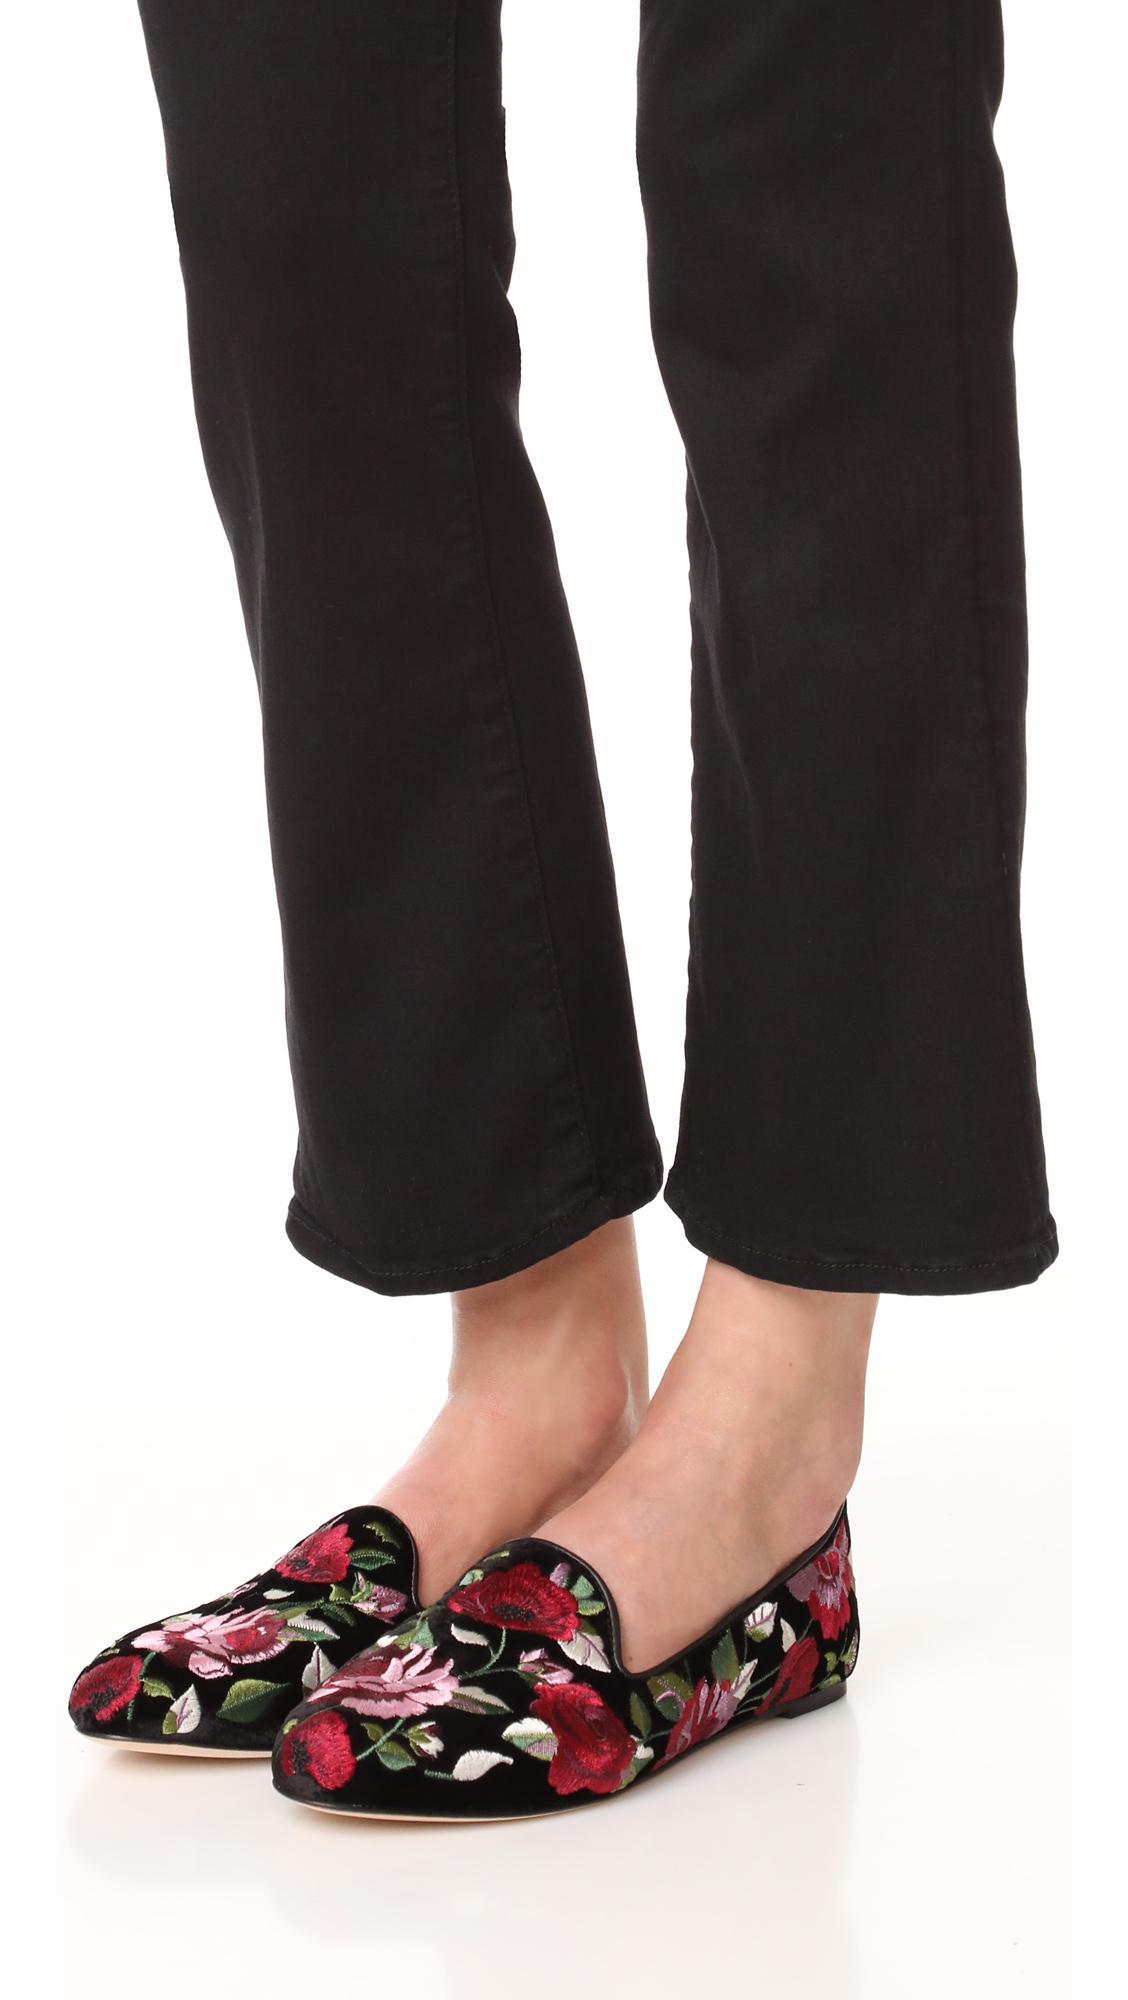 138bf7b63493 Lyst - Kate Spade Swinton Floral Slip On Flats in Black